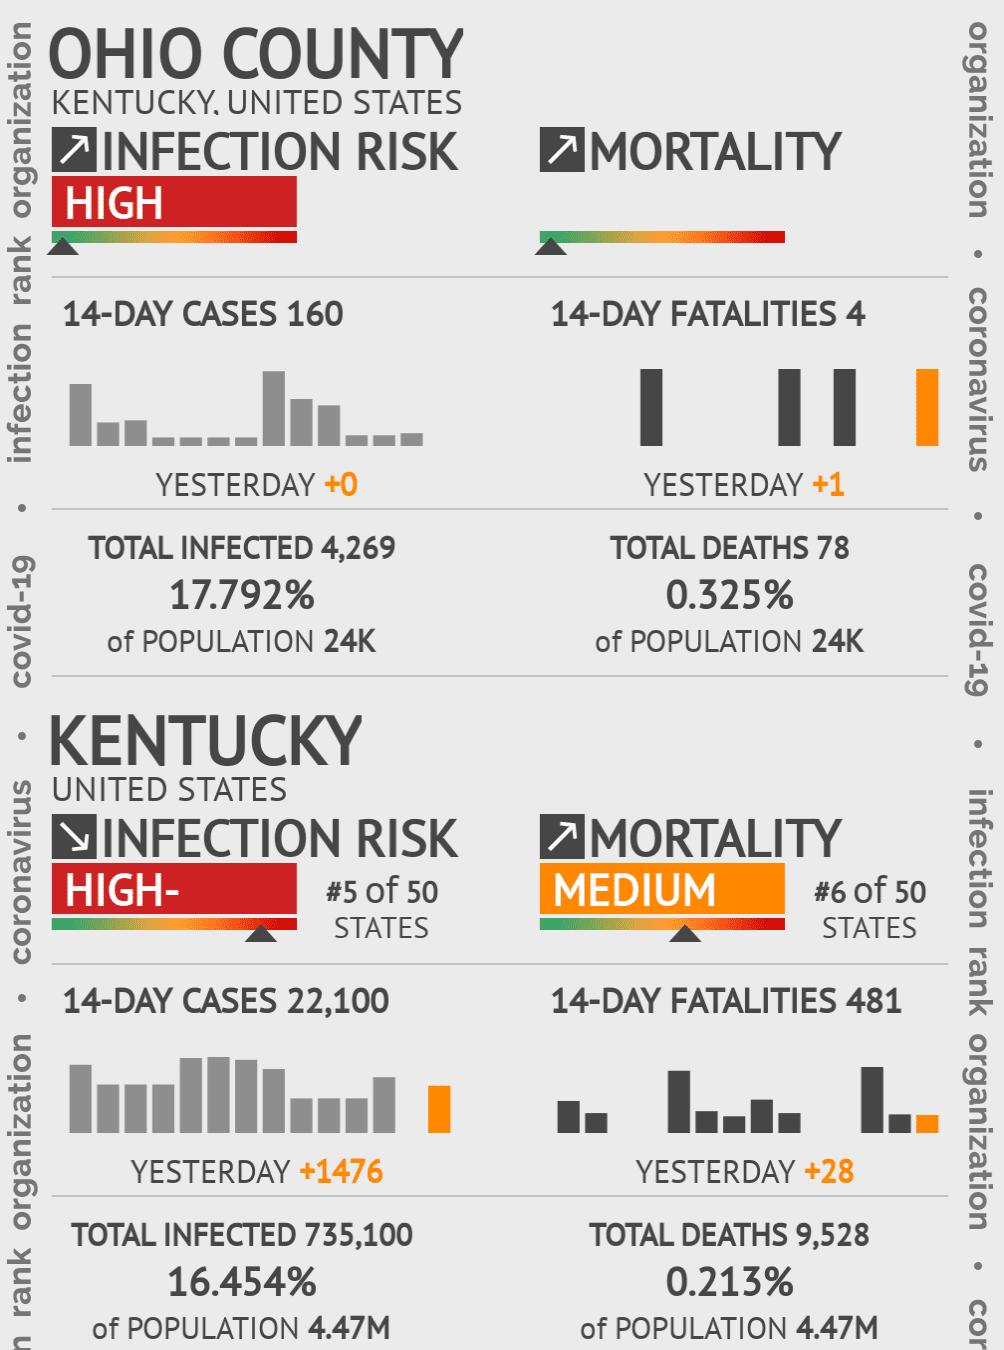 Ohio County Coronavirus Covid-19 Risk of Infection on July 24, 2021